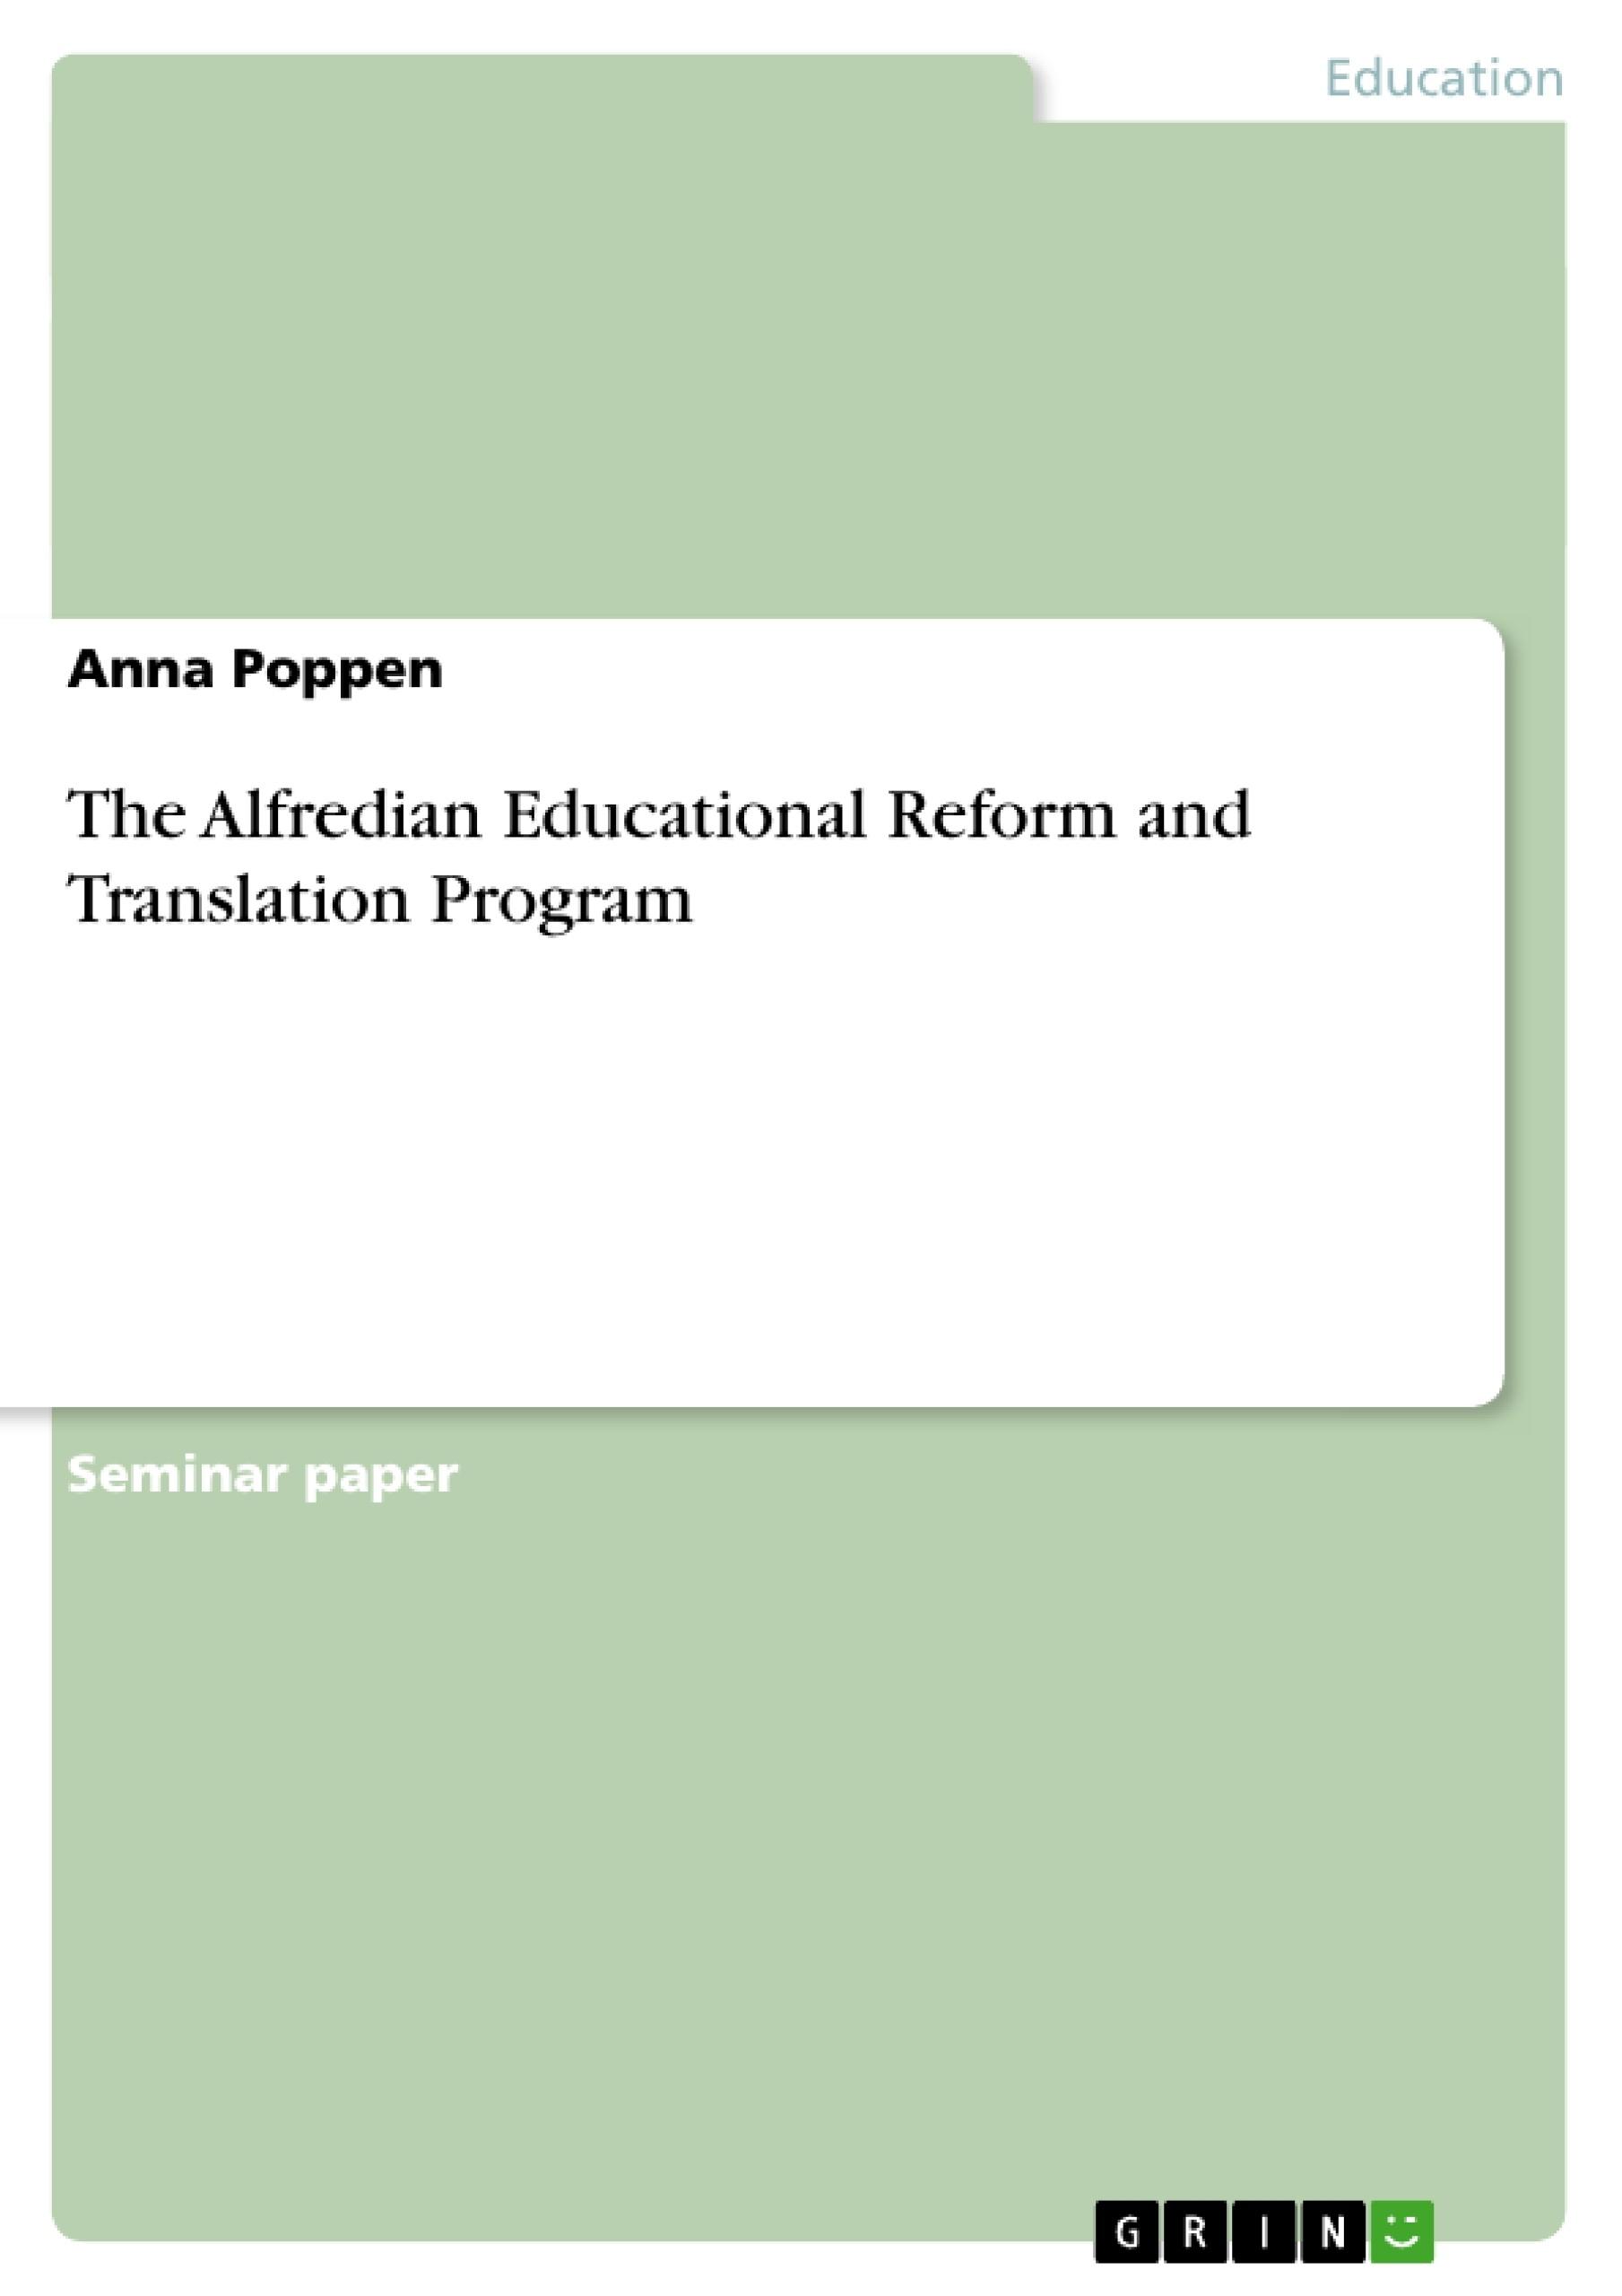 Title: The Alfredian Educational Reform and Translation Program